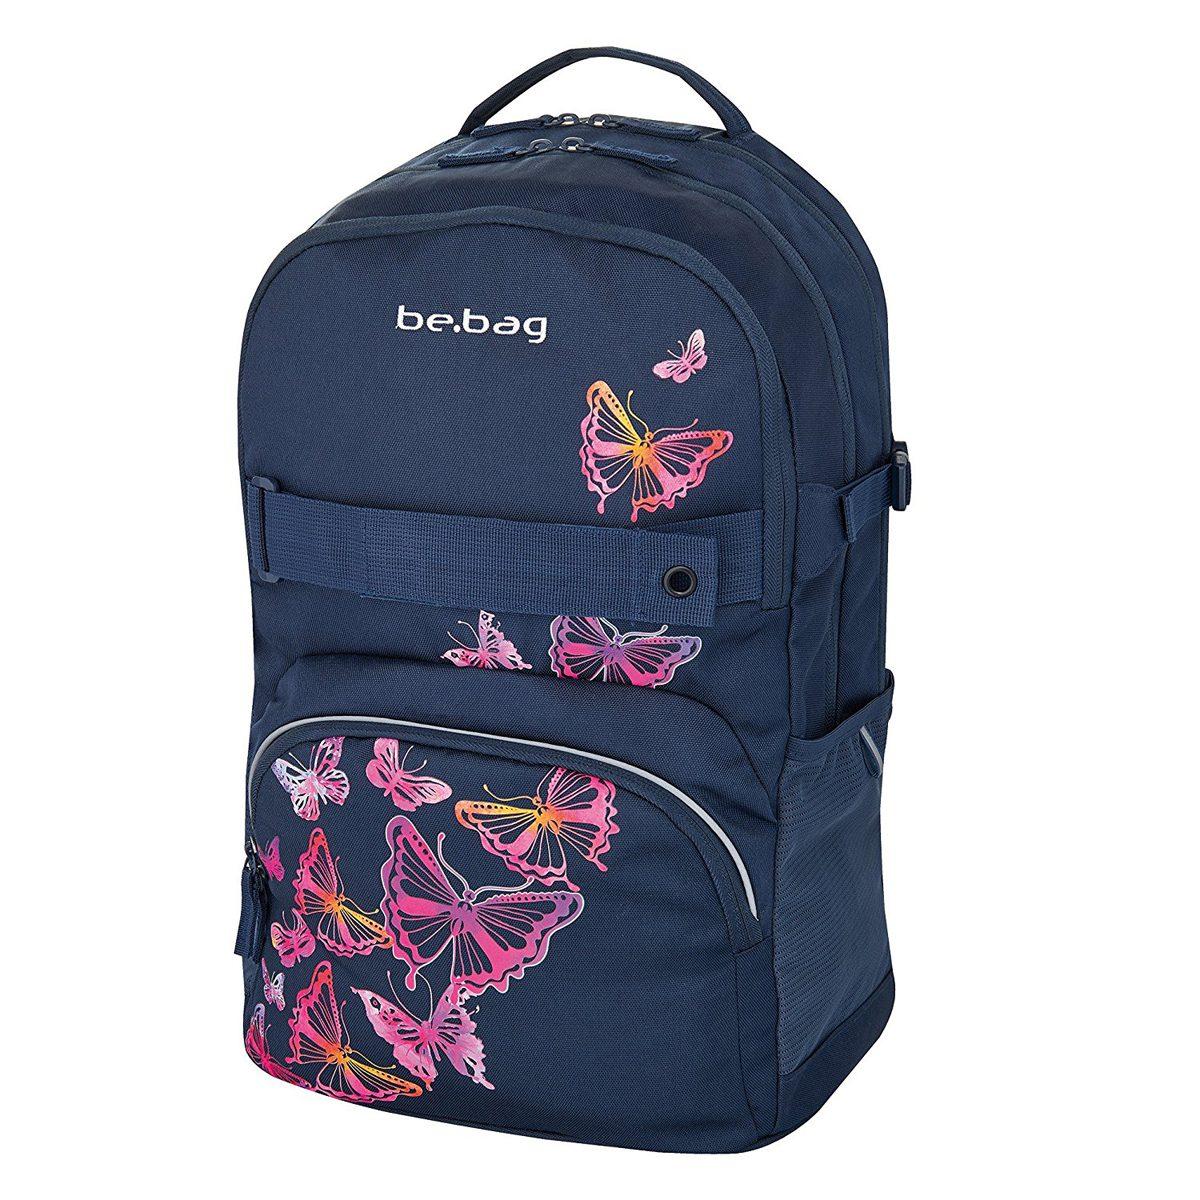 Rucsac Be.Bag Ergonomic, Cube Butterfly, Herlitz, 11410347